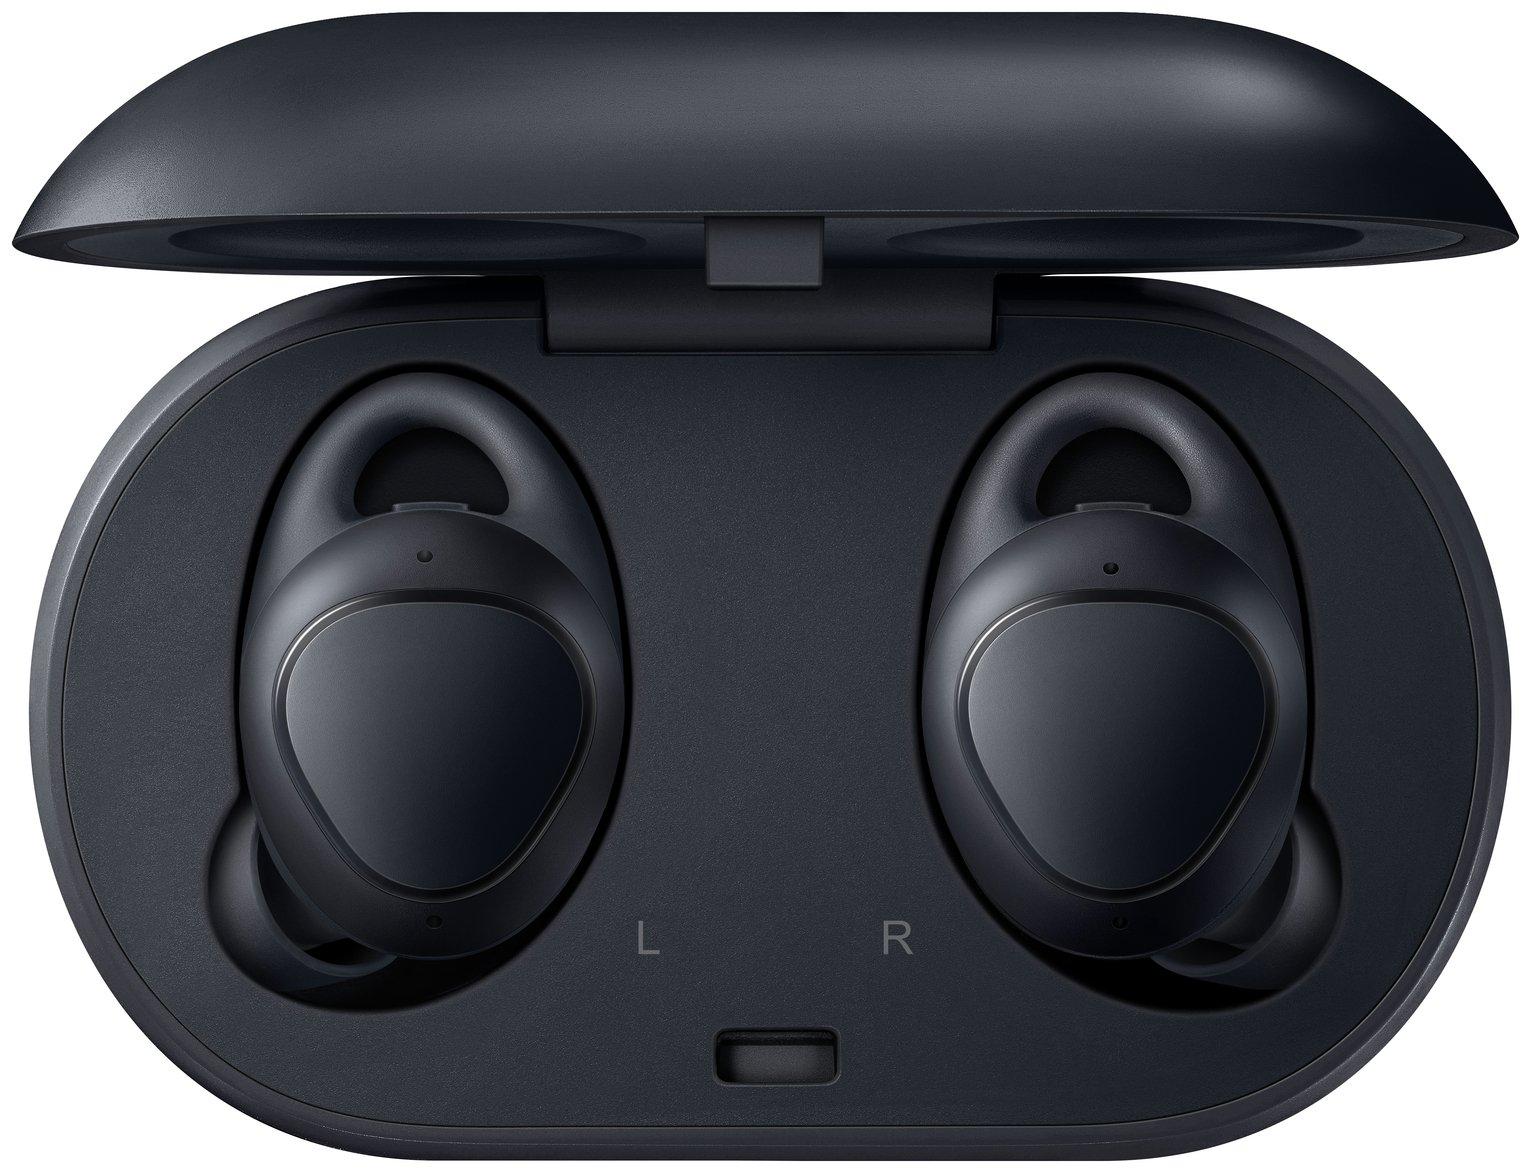 Samsung Gear IconX In-Ear Headphones - Black